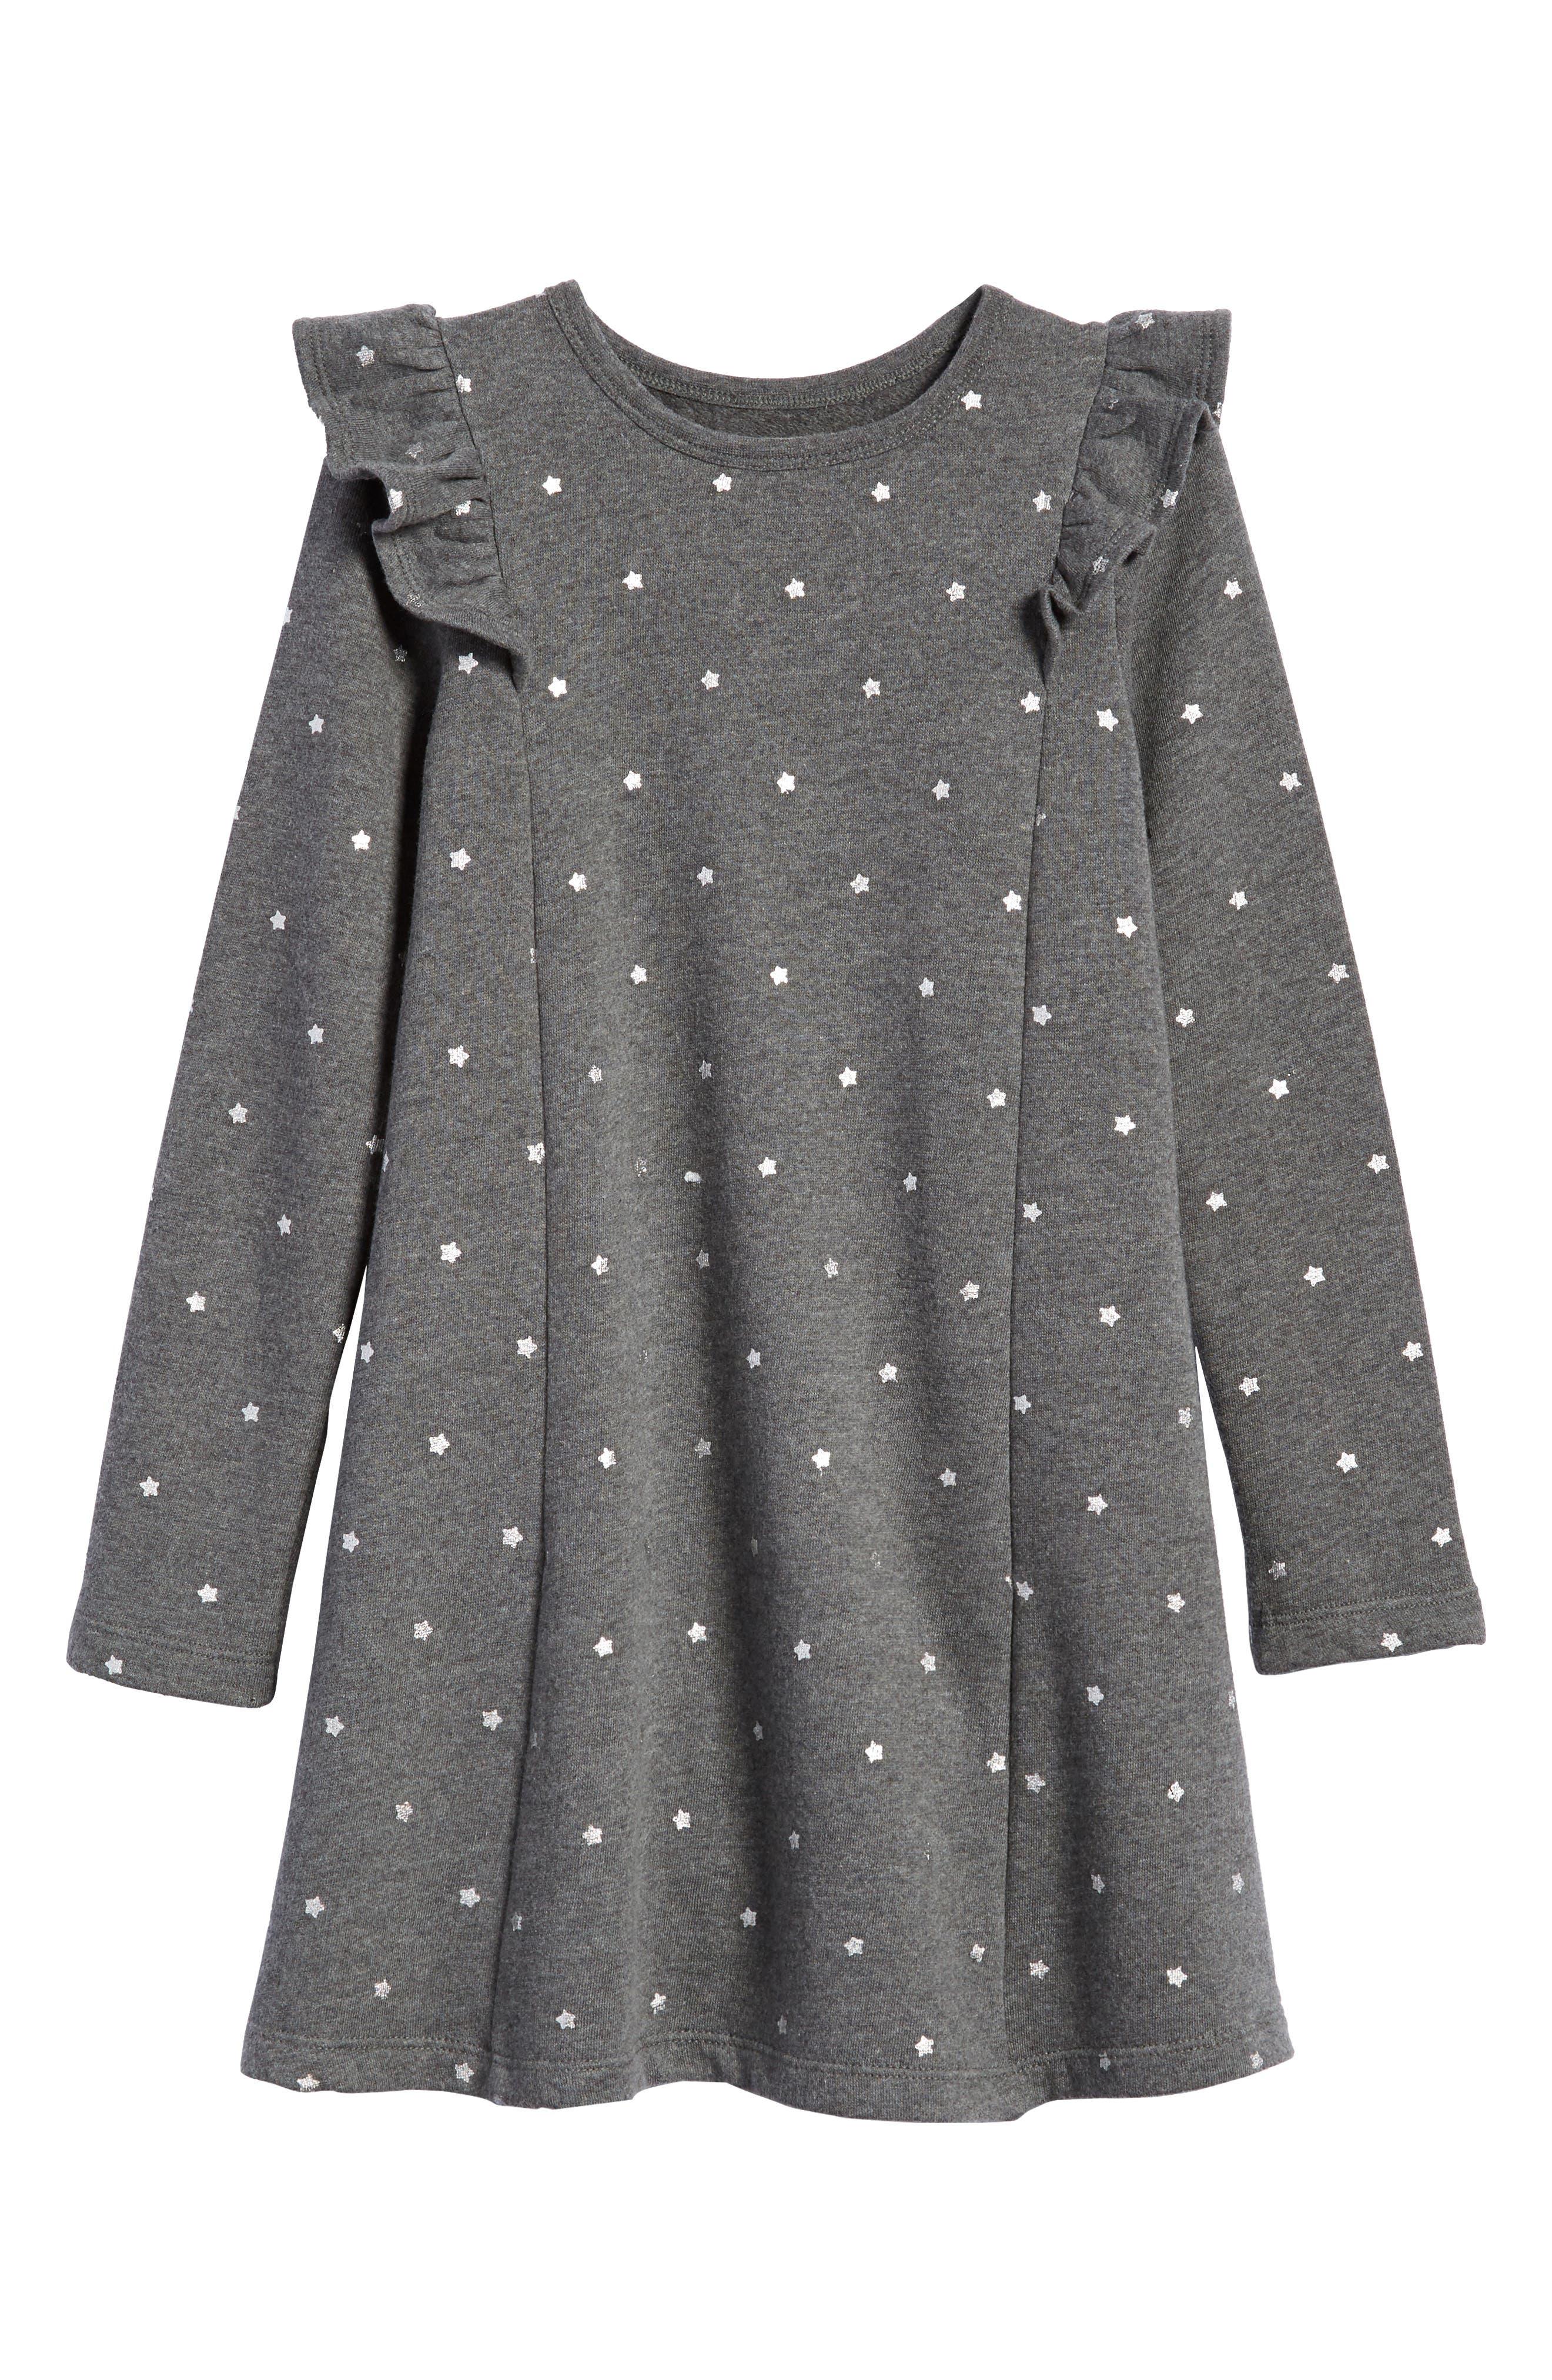 Ruffle Fleece Sweater Dress,                         Main,                         color, GREY CHARCOAL HEATHER STARS